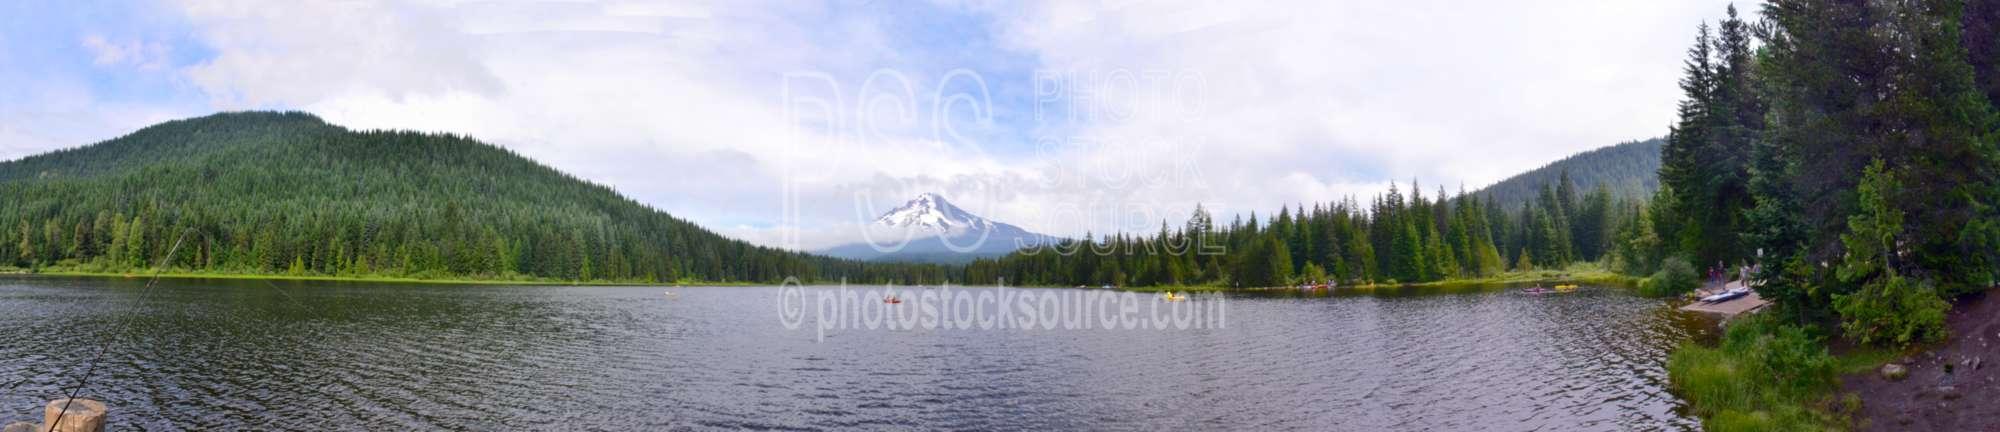 Mt. Hood over Trillium Lake